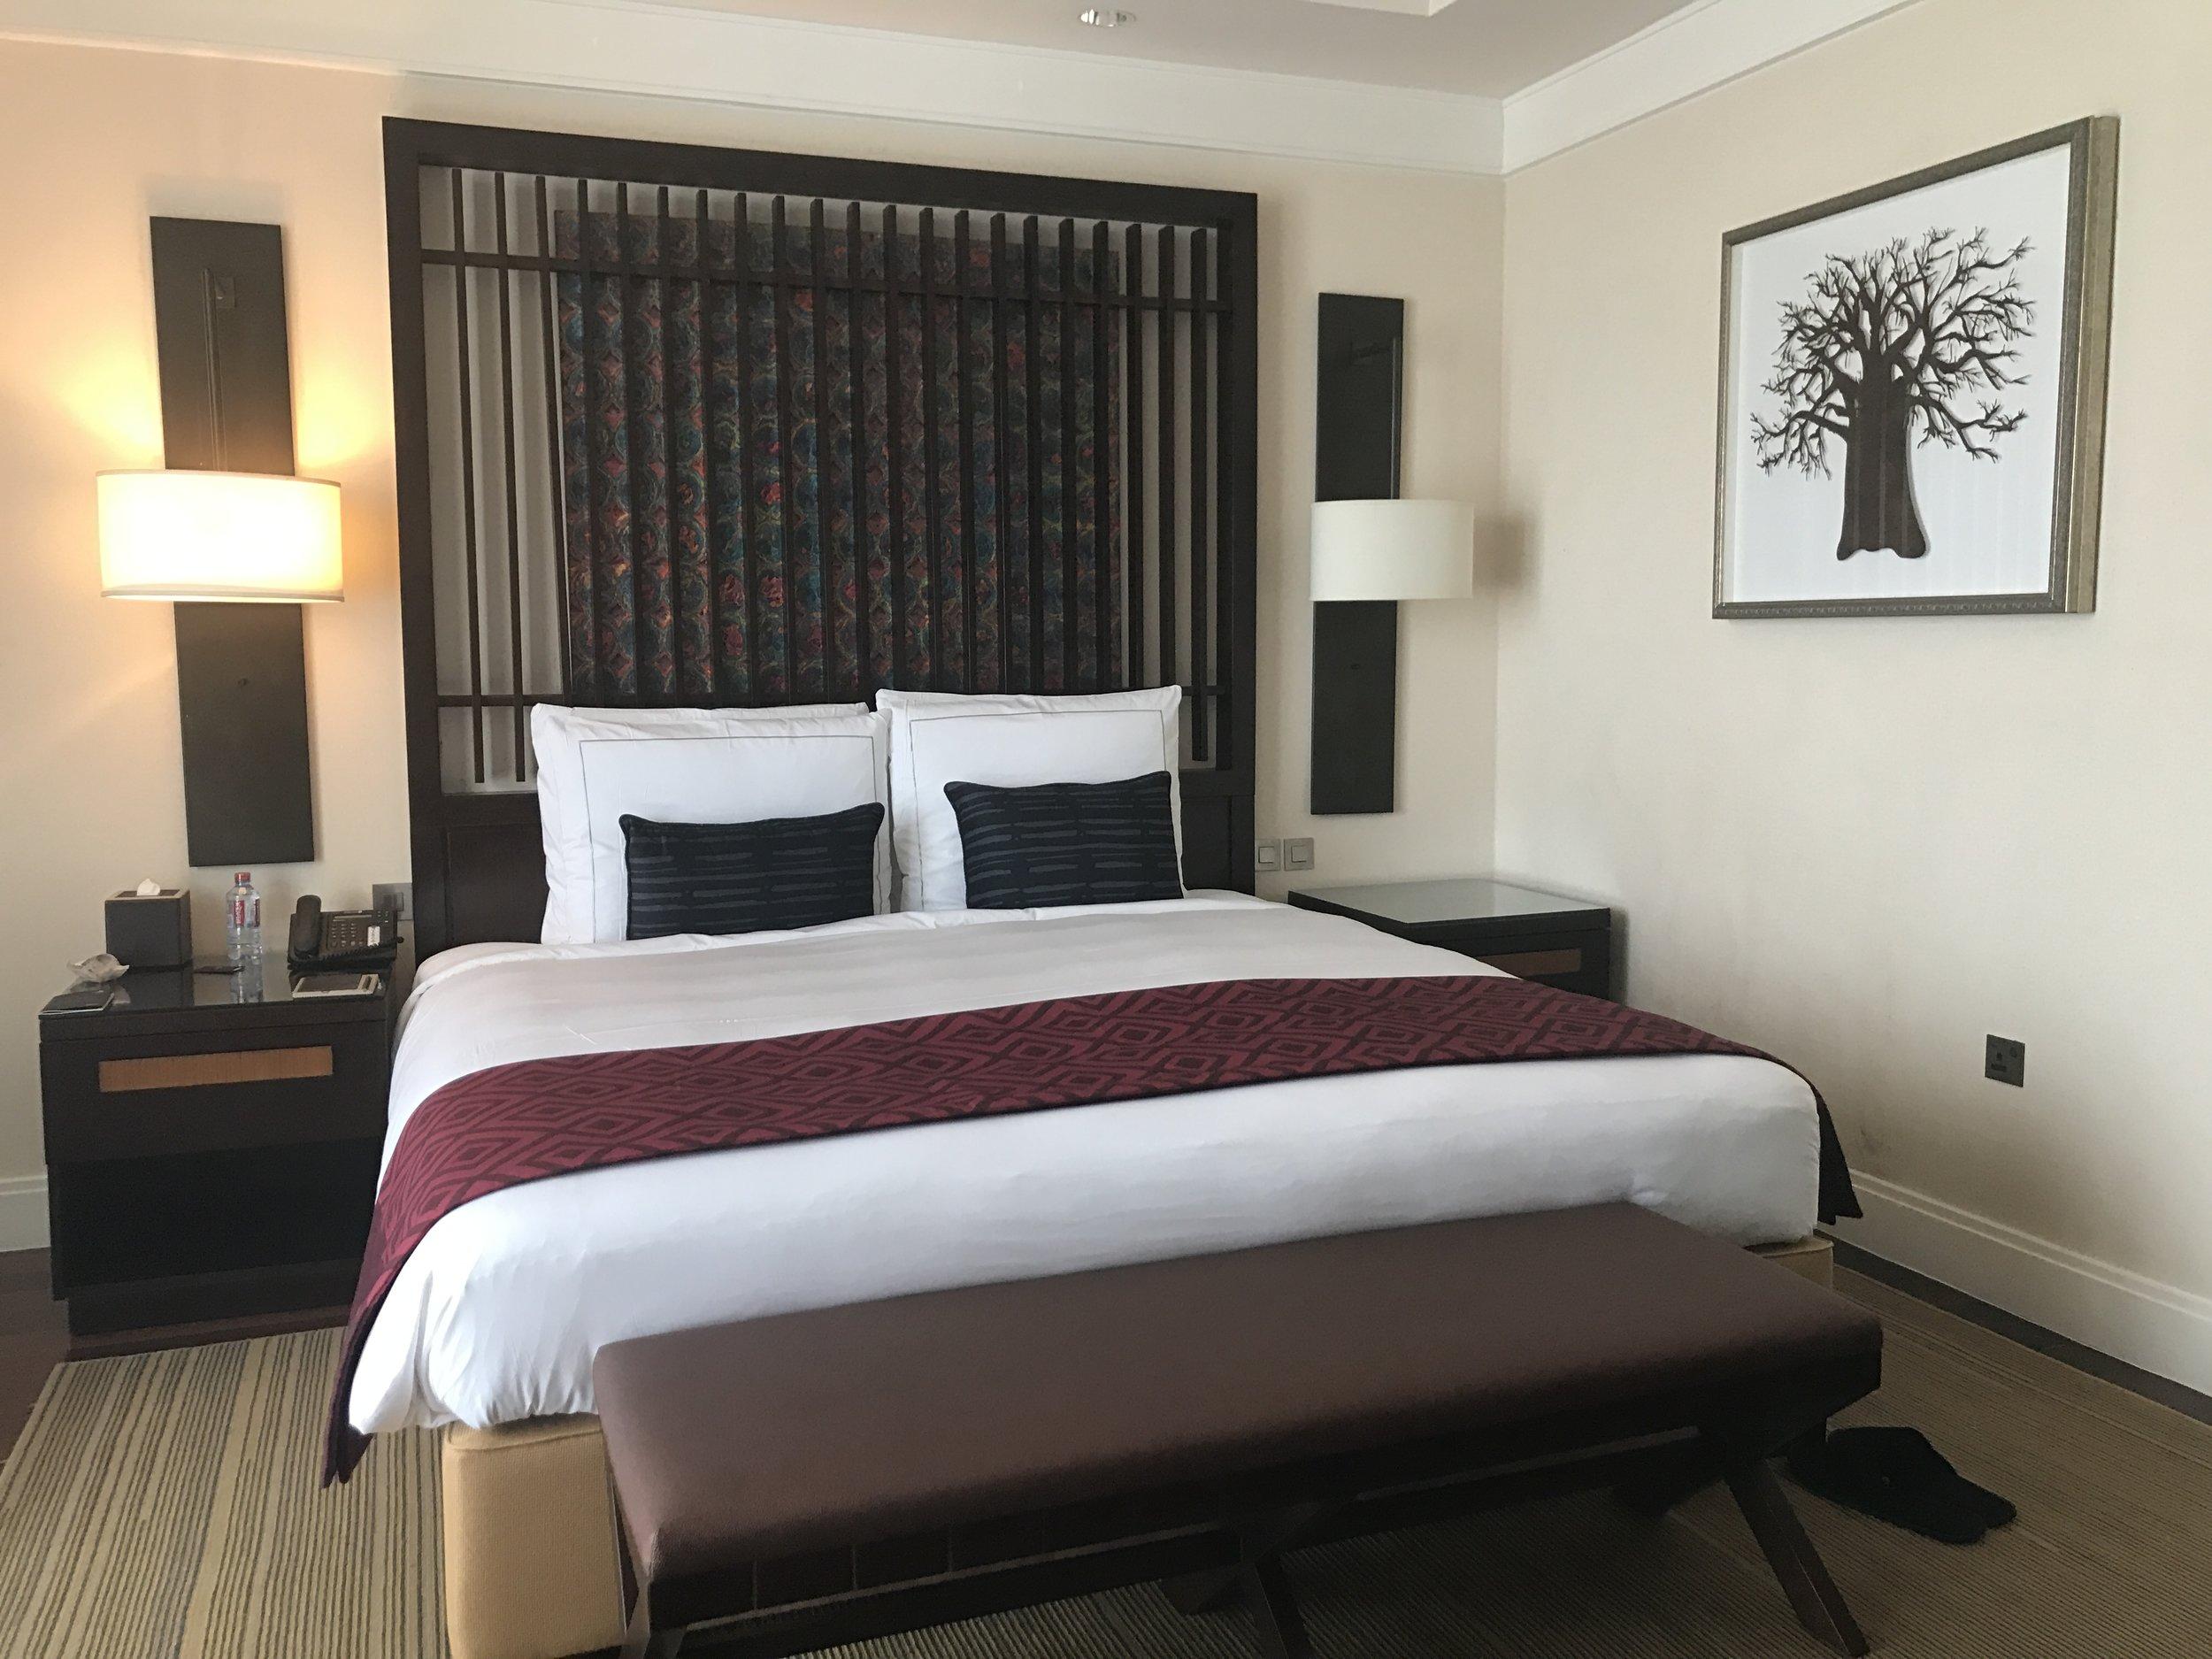 Kempinski-Goldcoast-Accra-Hotel-Review-Photos-vickieremoeofficial11.JPG